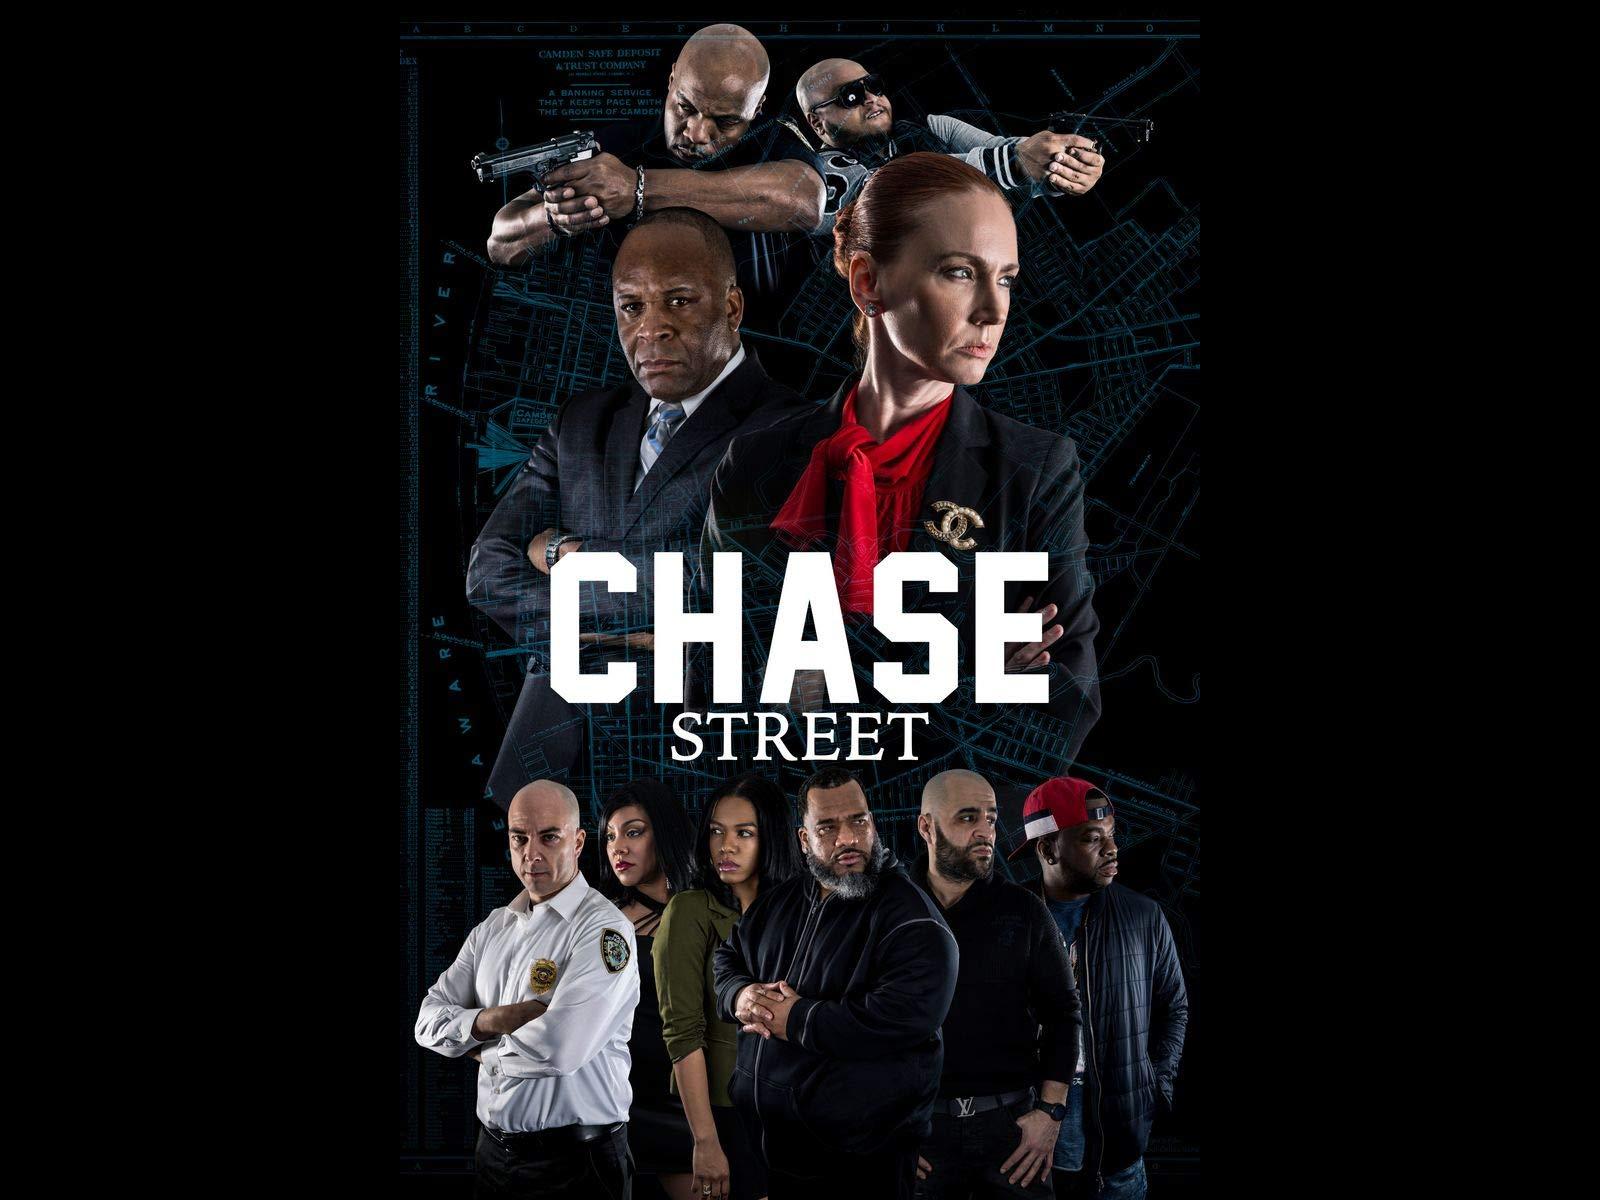 Chase Street - Season 1